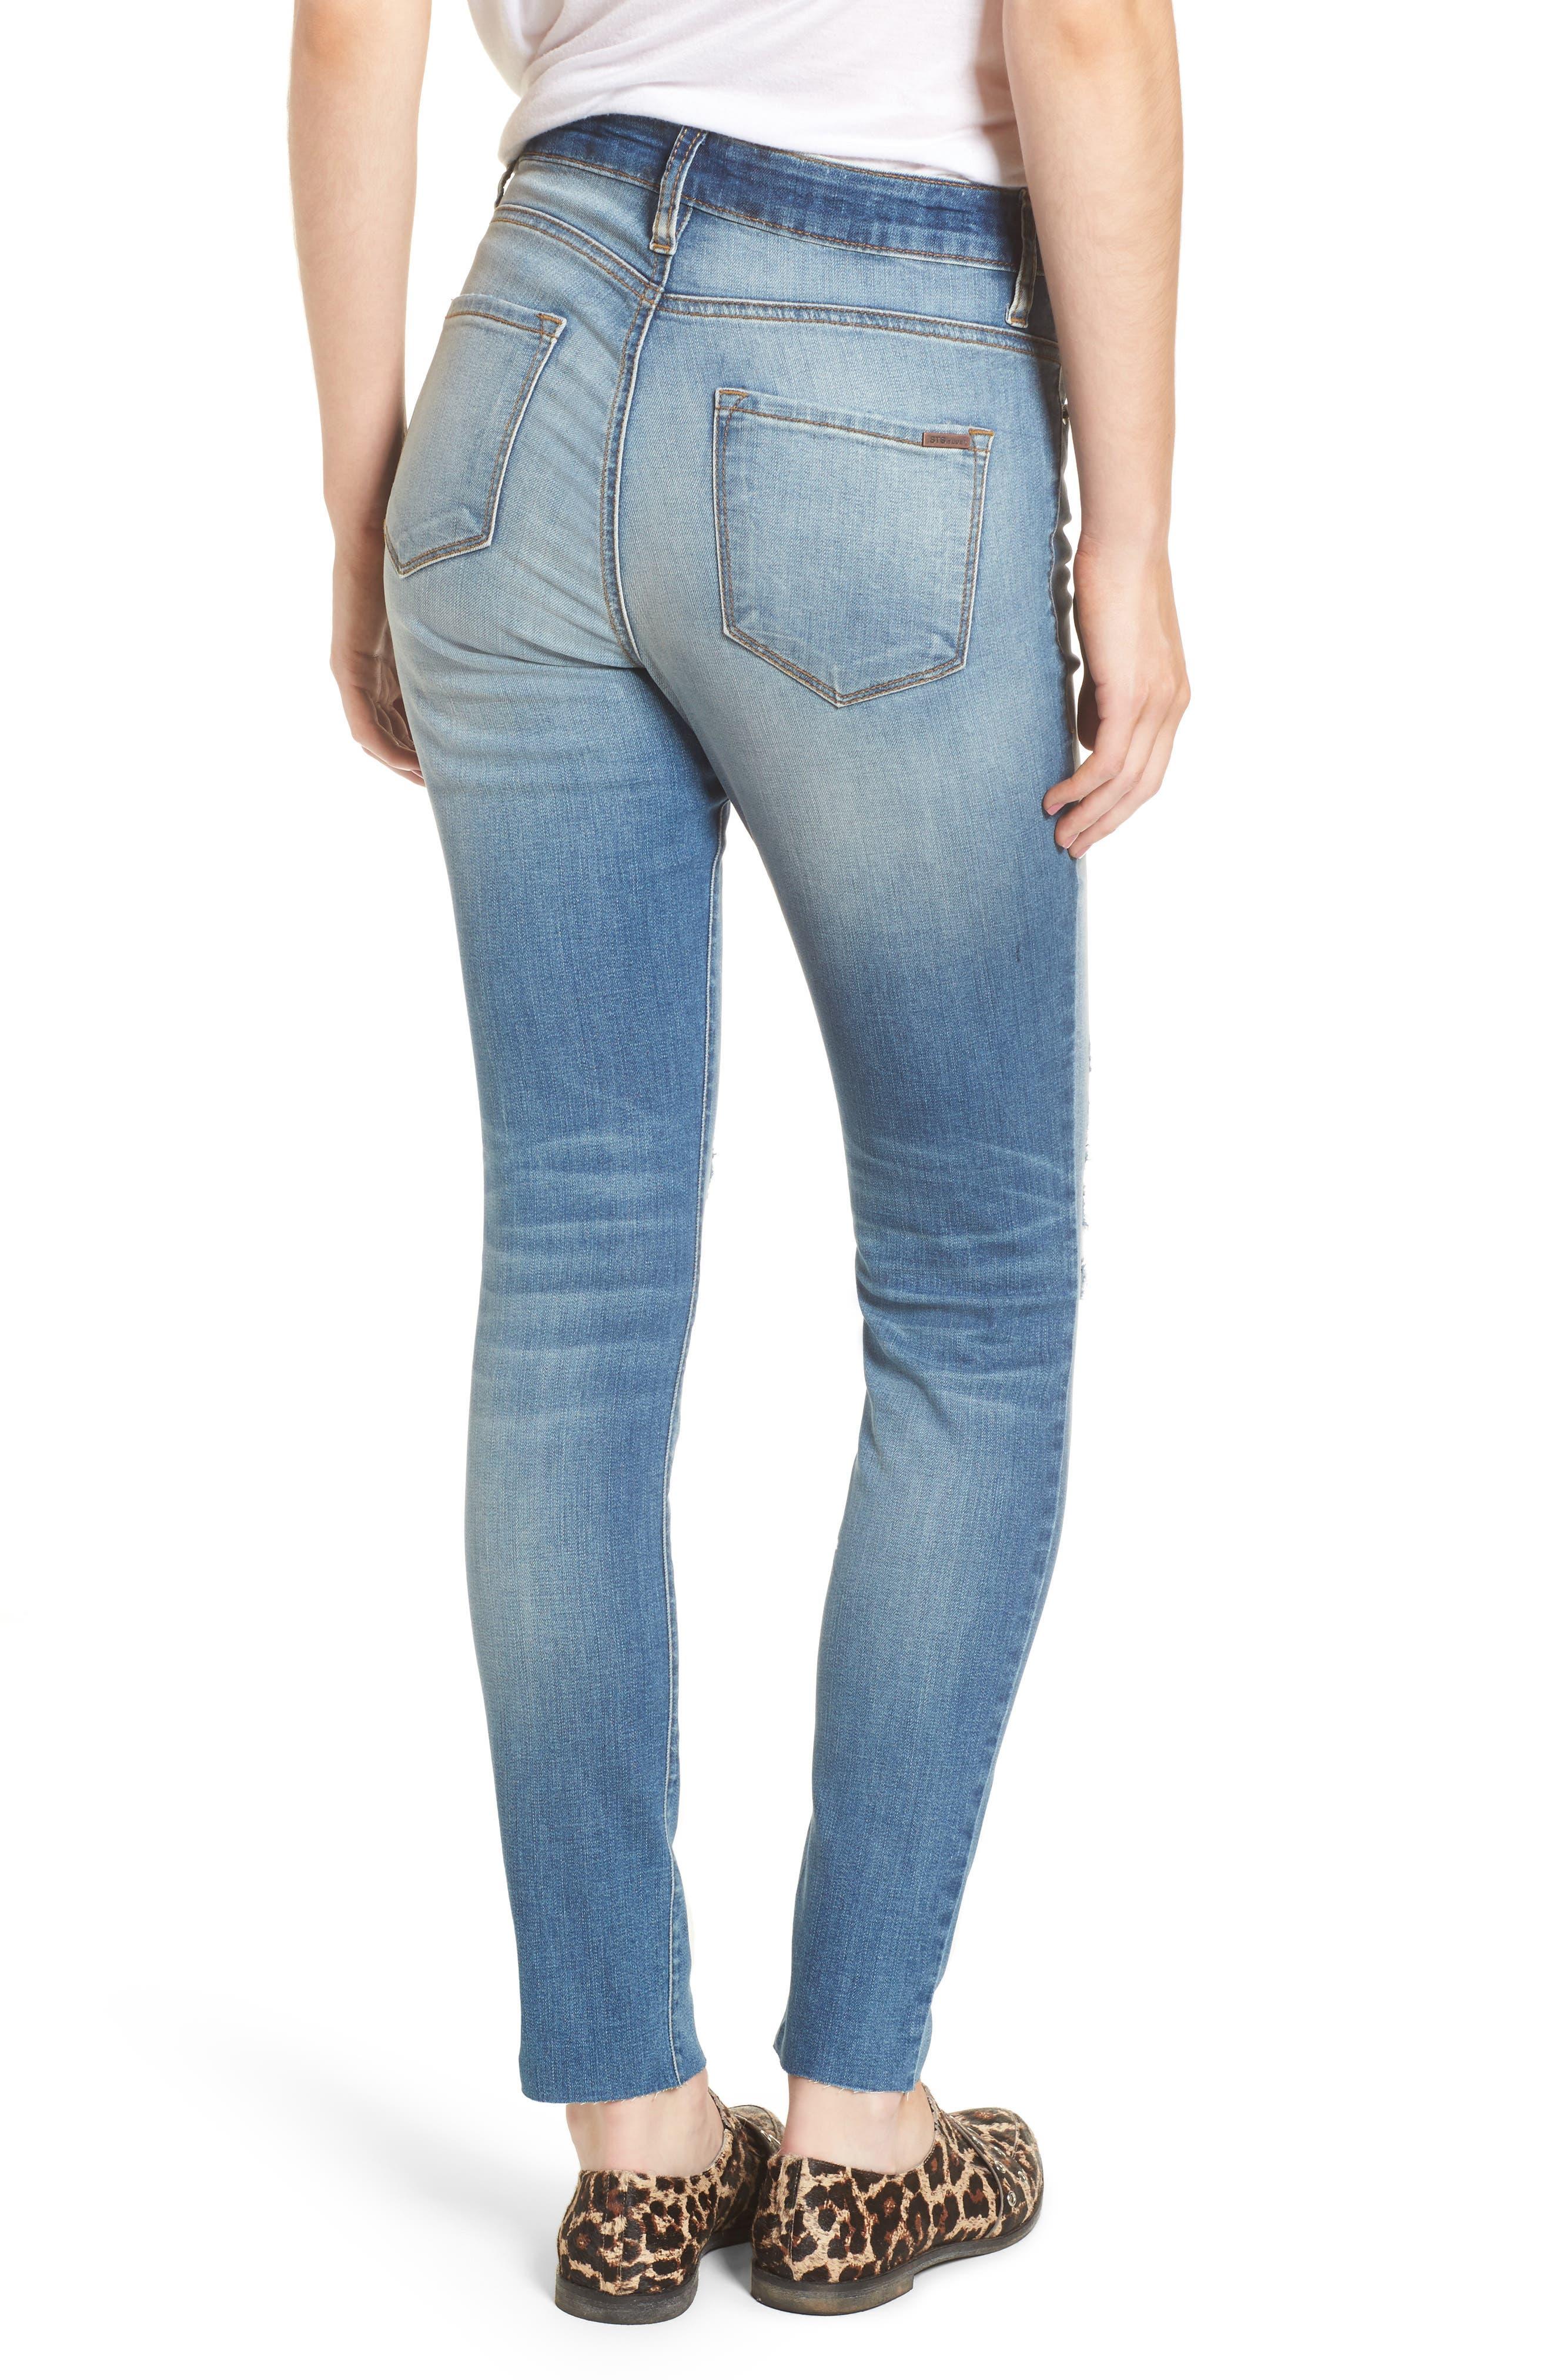 Ellie Ripped High Waist Skinny Jeans,                             Alternate thumbnail 2, color,                             400